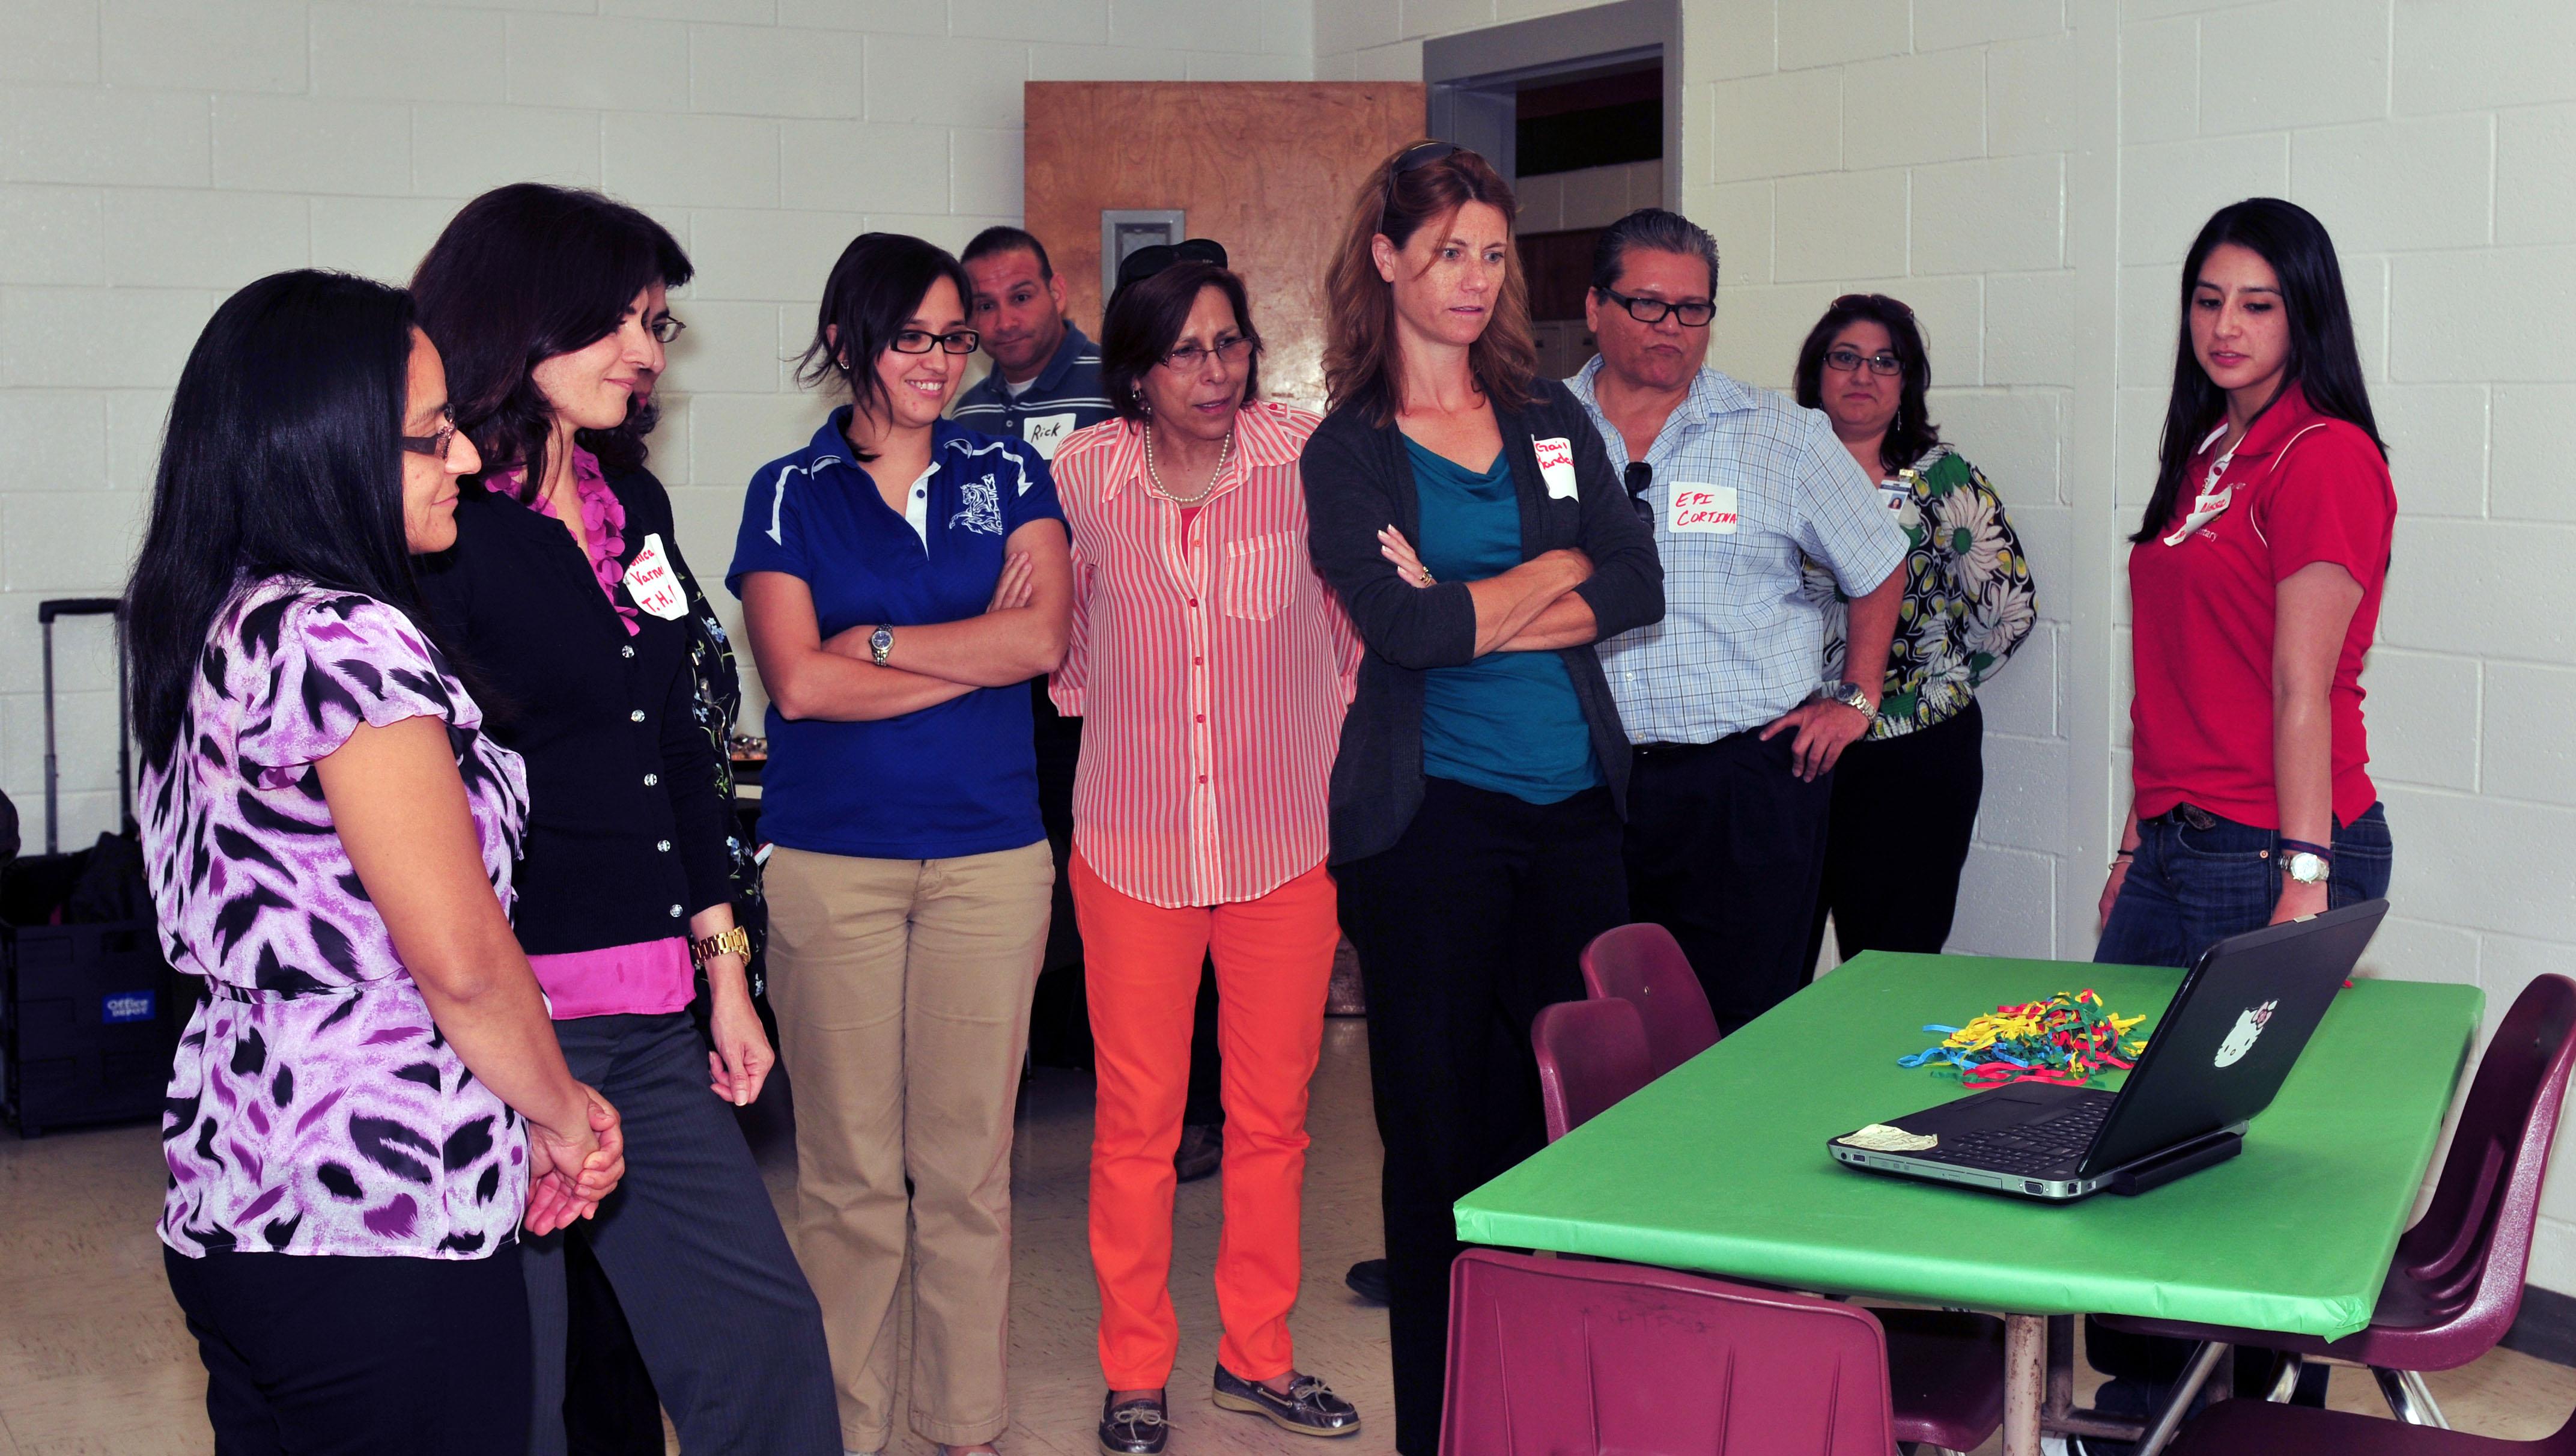 Vertical Teams work together for student success